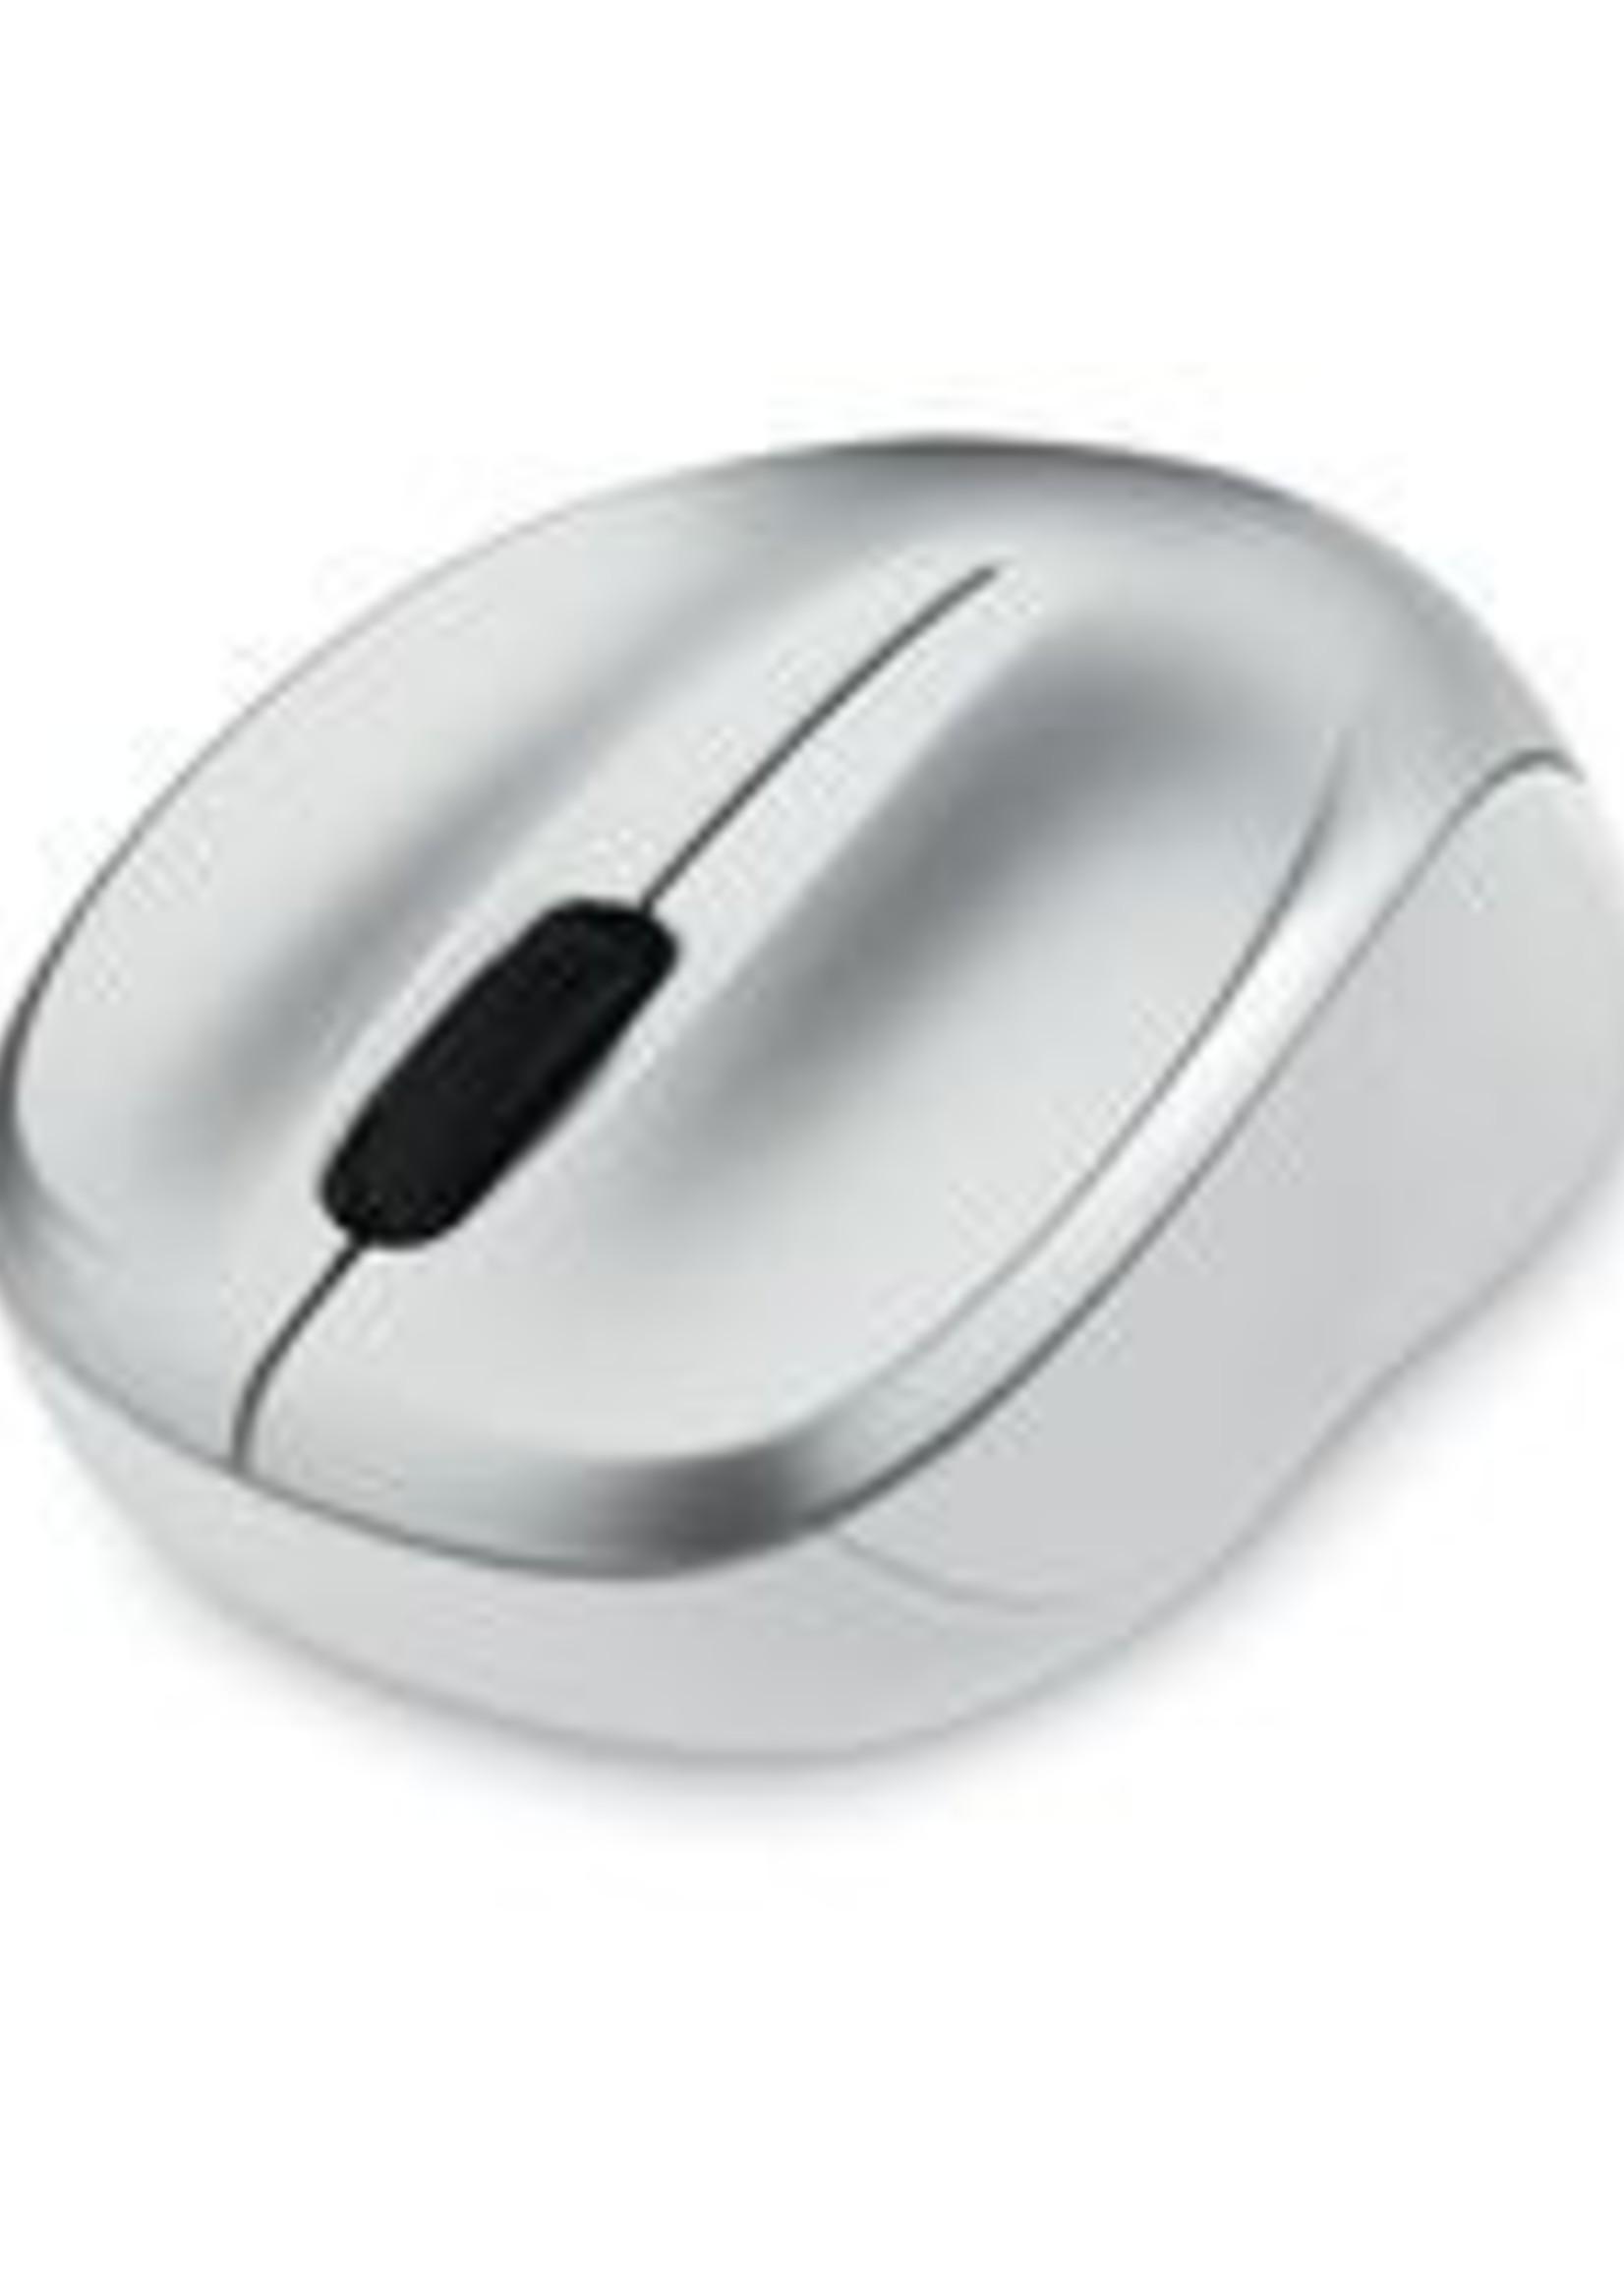 Verbatim Verbatim Silent Wireless Blue LED Mouse - Silver